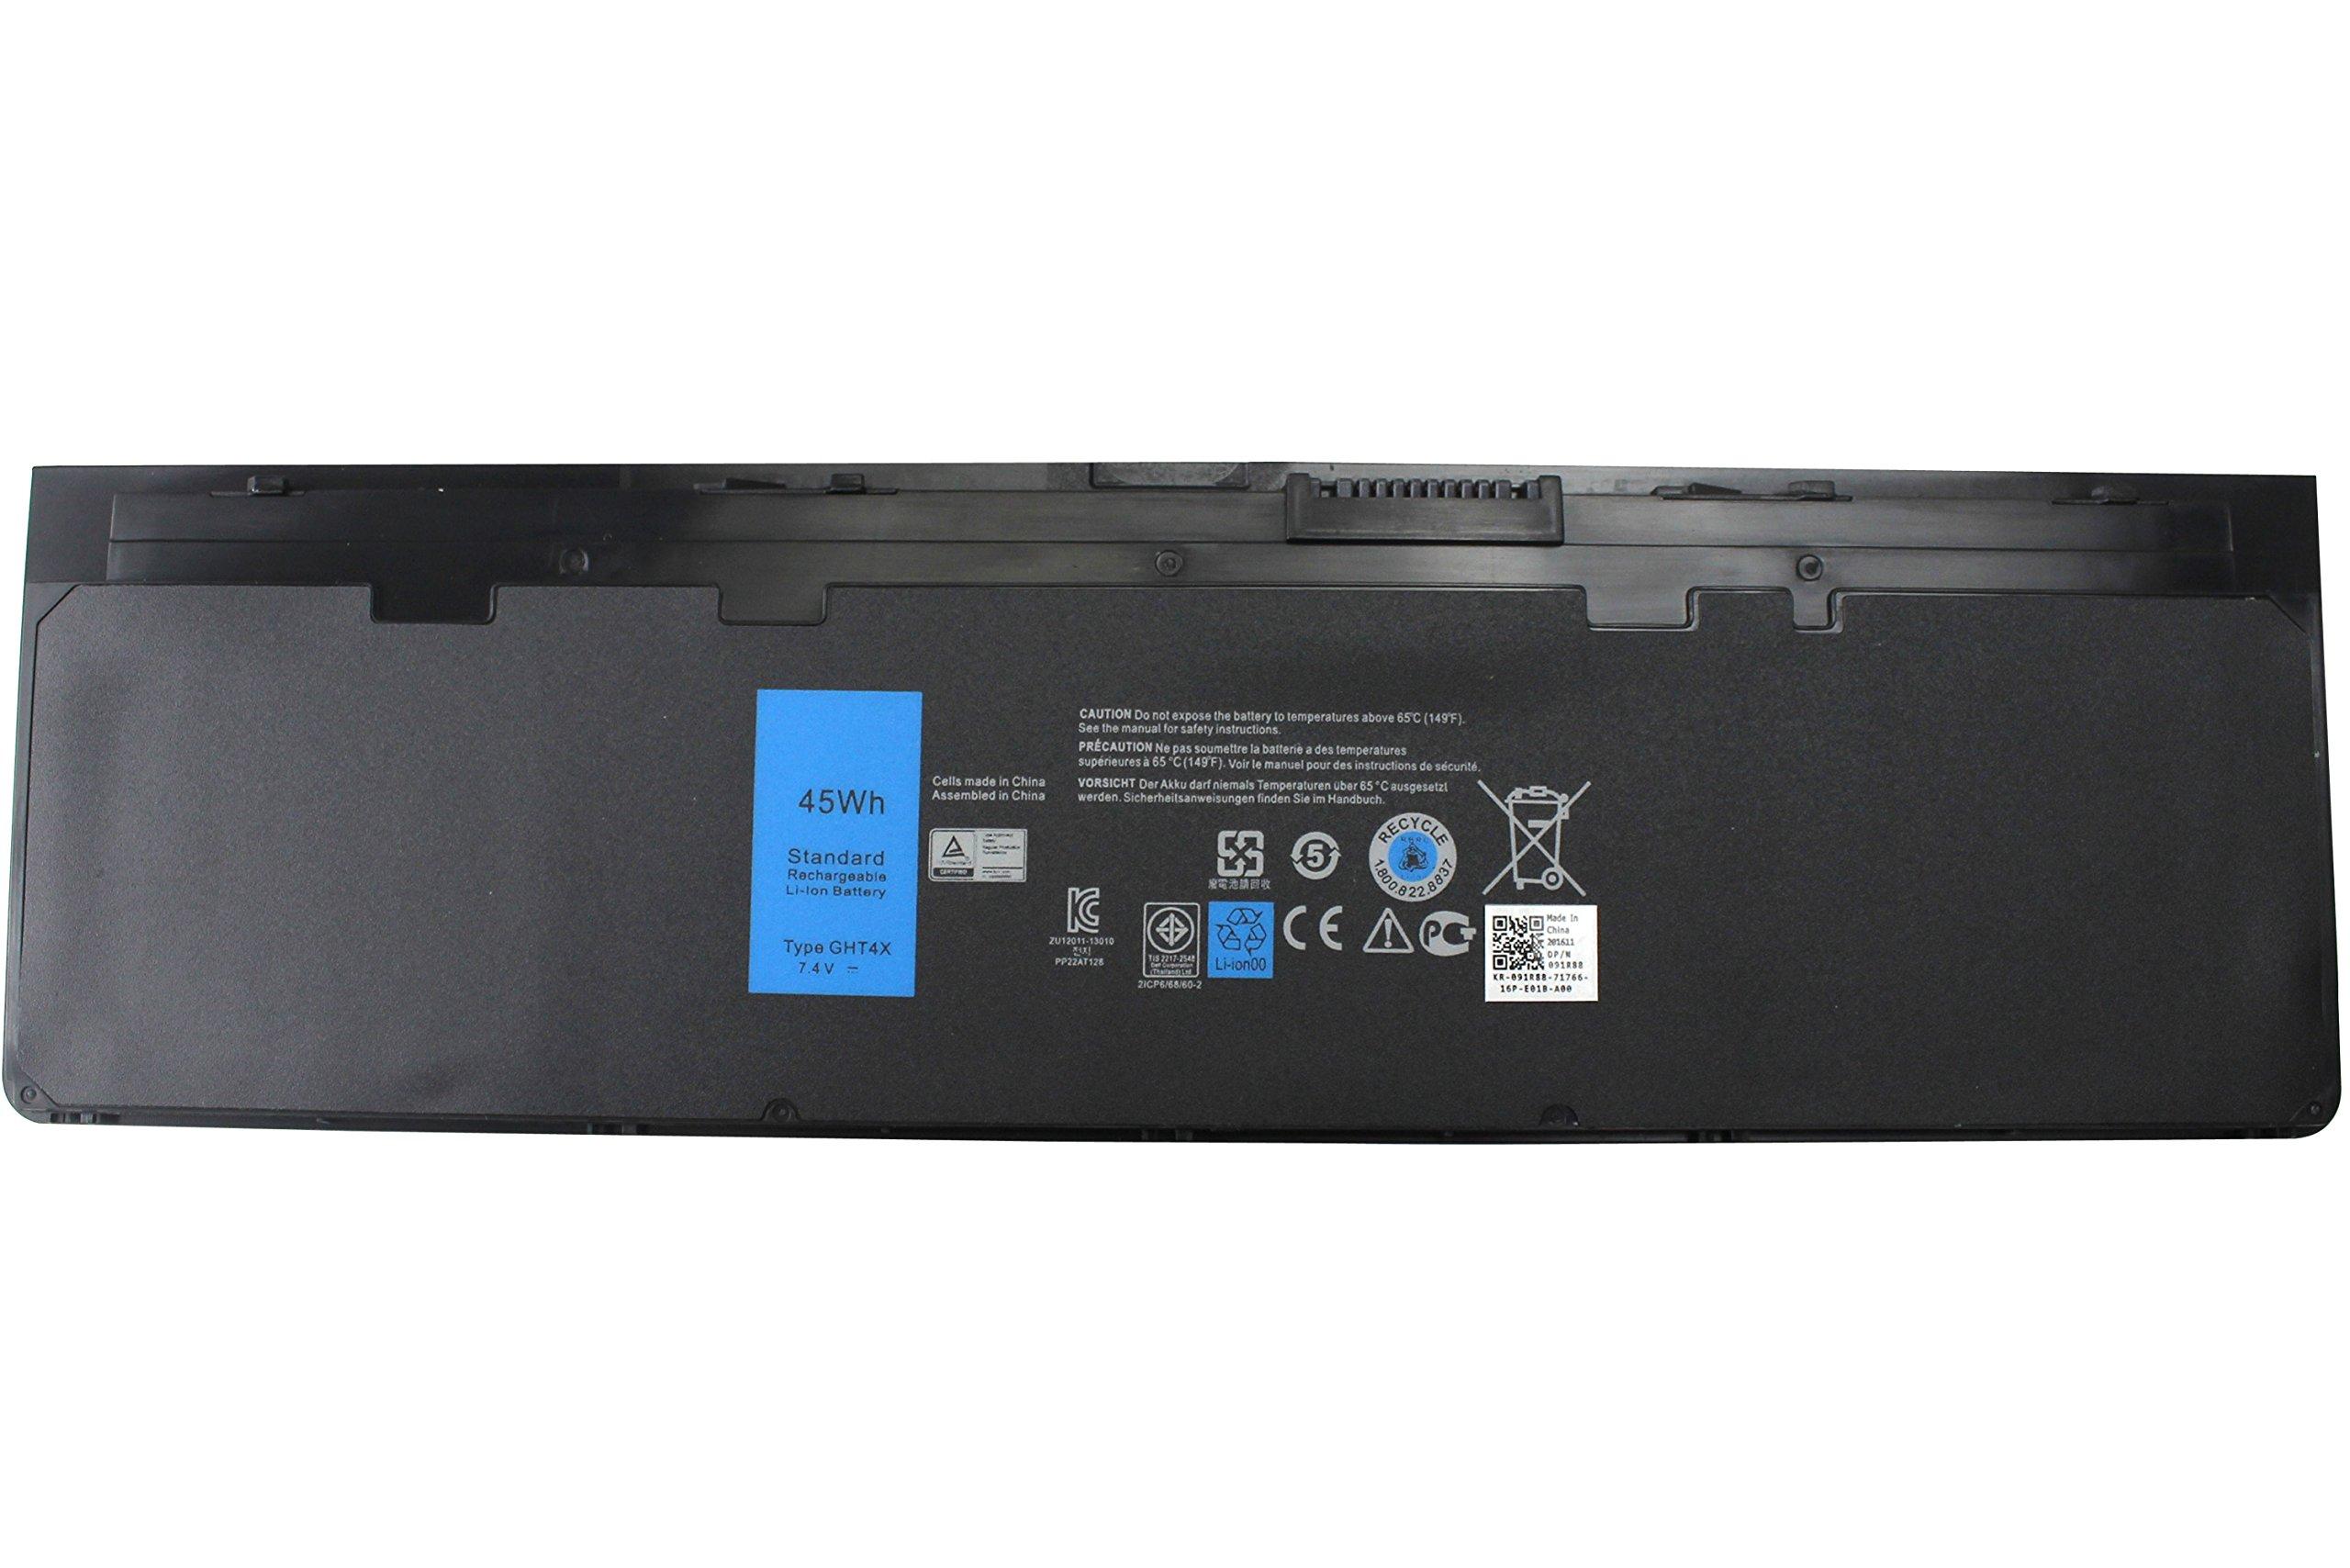 Bateria E7240 GHT4X 7.4V 45WH 4 Celdas 12.5 para Dell Latitude E7250 GD076 Ultrabook X01 PT1 451-BBFX 451-BBFW 451-BBFT